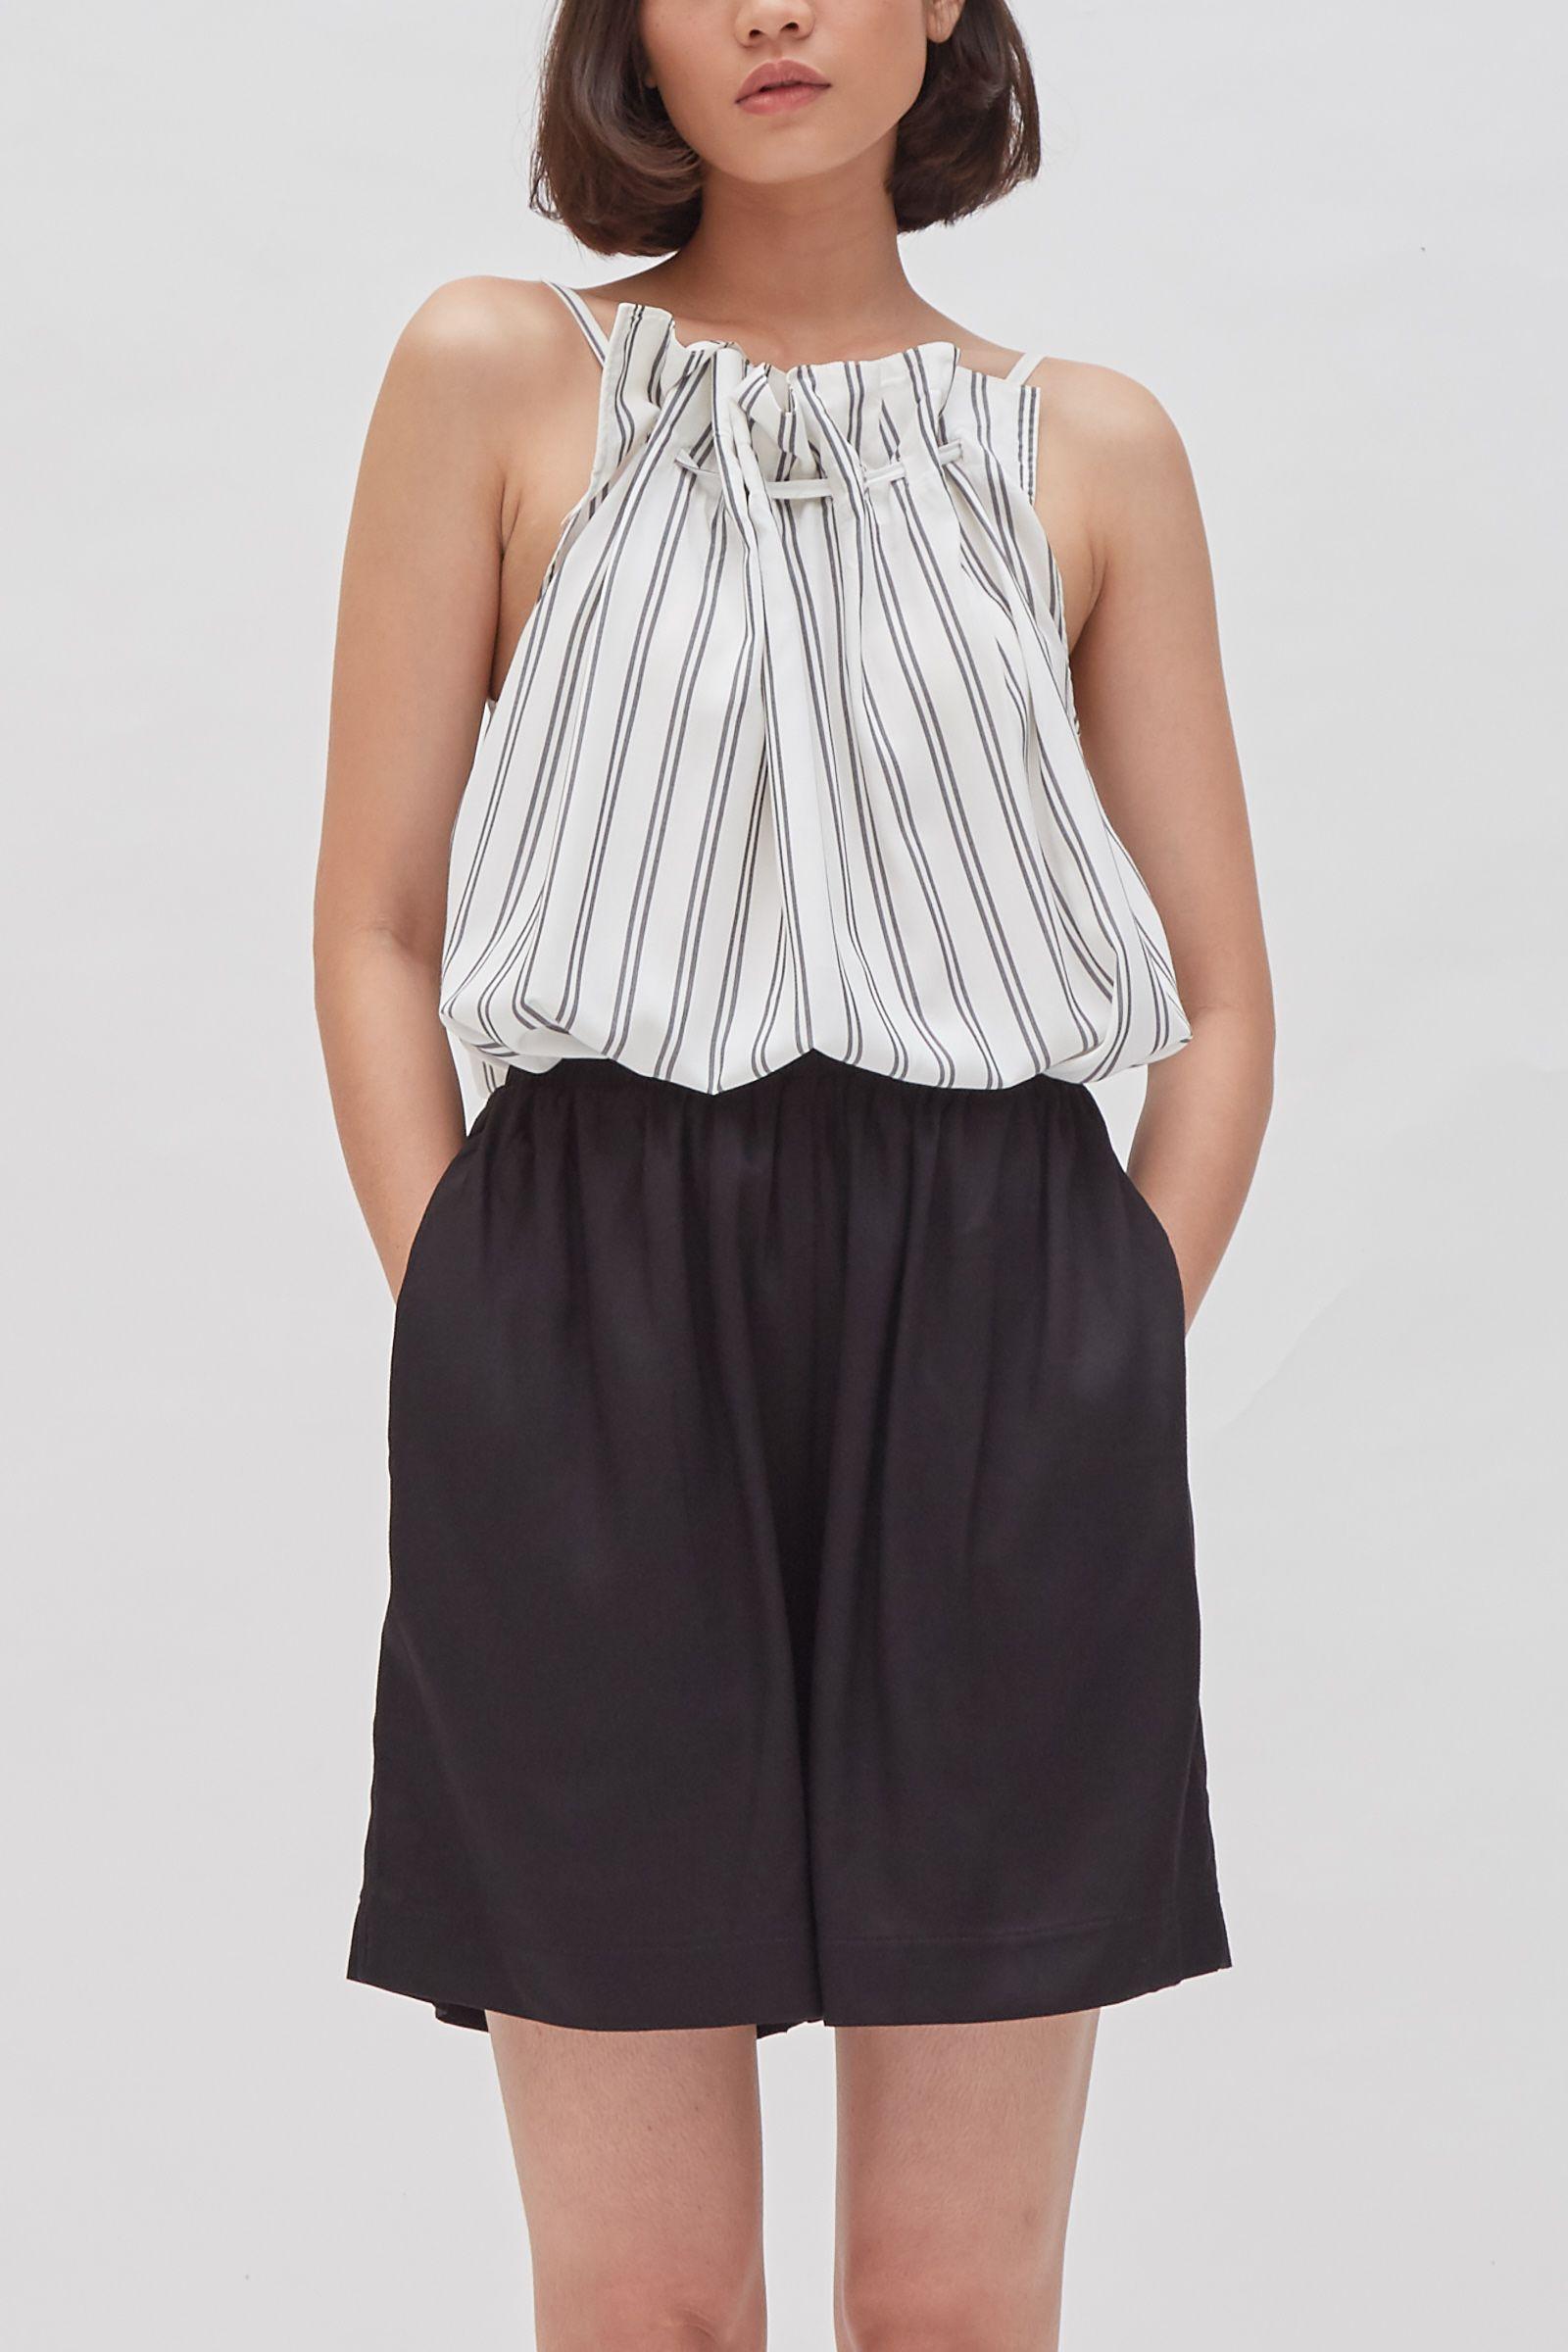 #PopbelaOOTD: Upgrade Koleksi Baju dengan Sleeveless Top Ini